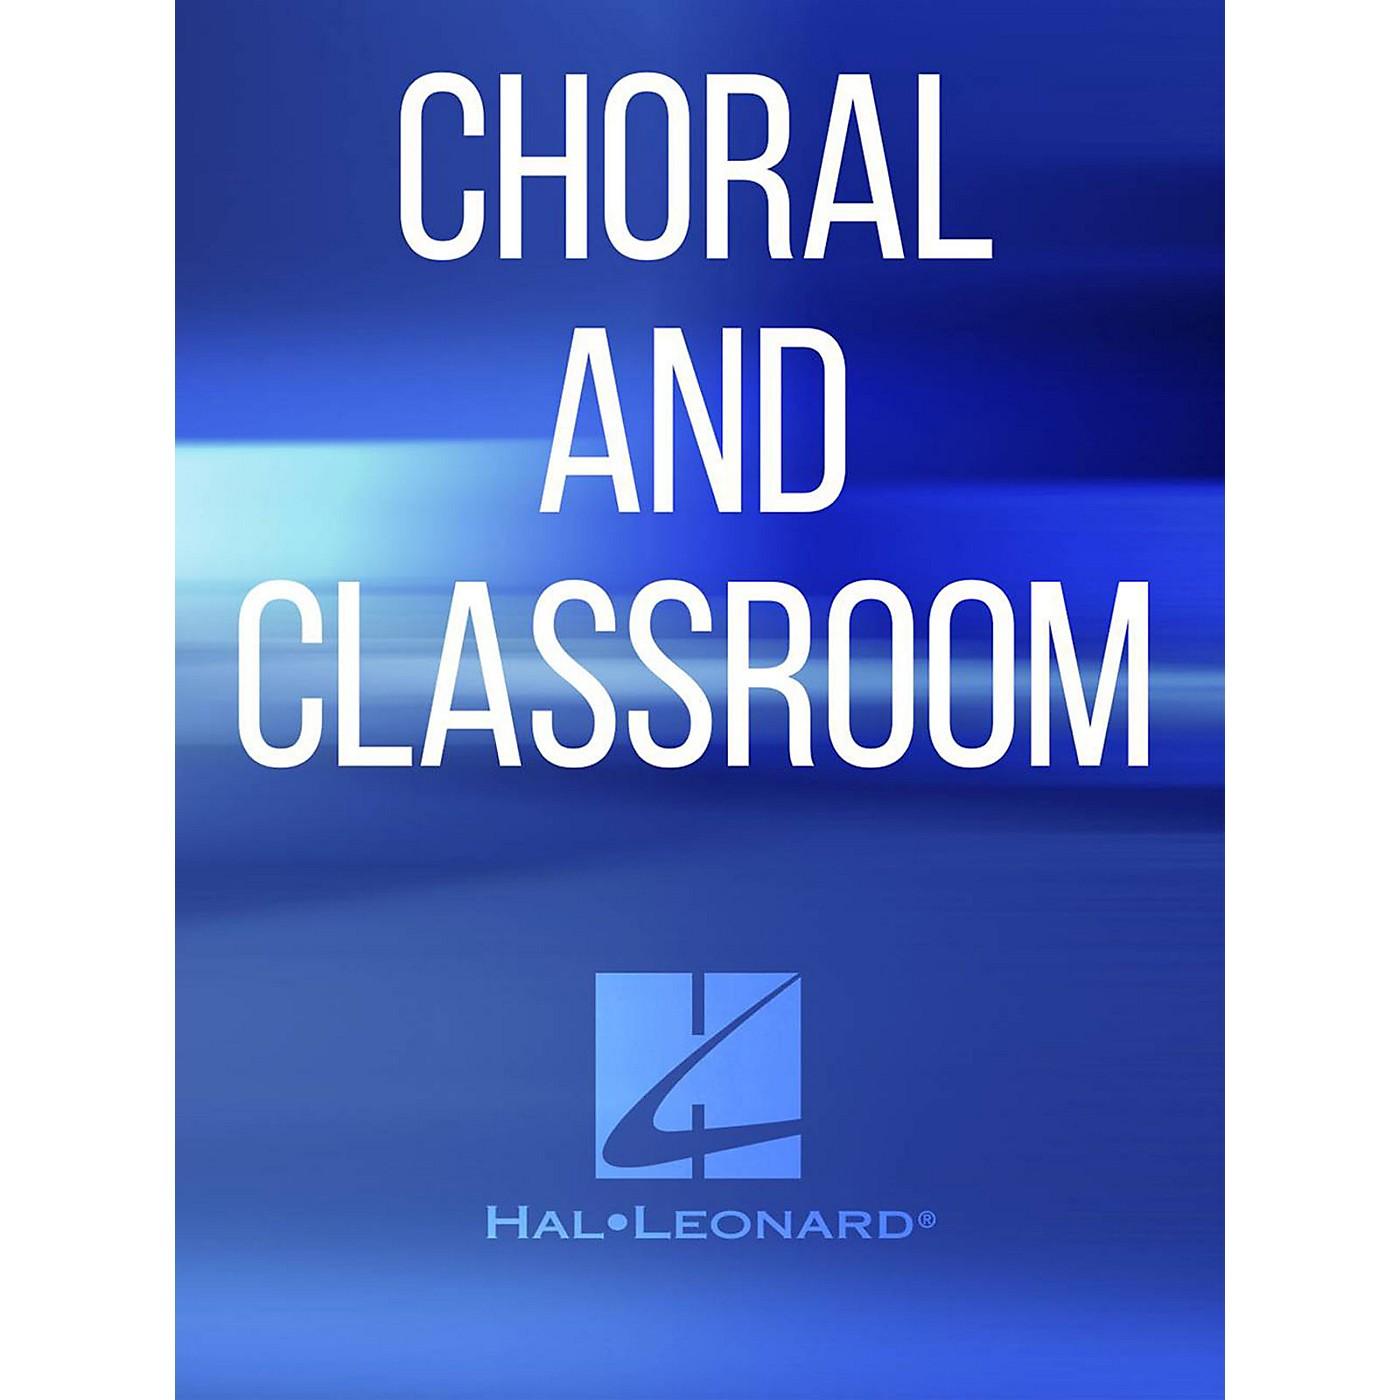 Hal Leonard The Twelve Days of Christmas (Musical) ShowTrax CD Arranged by Mark Brymer thumbnail